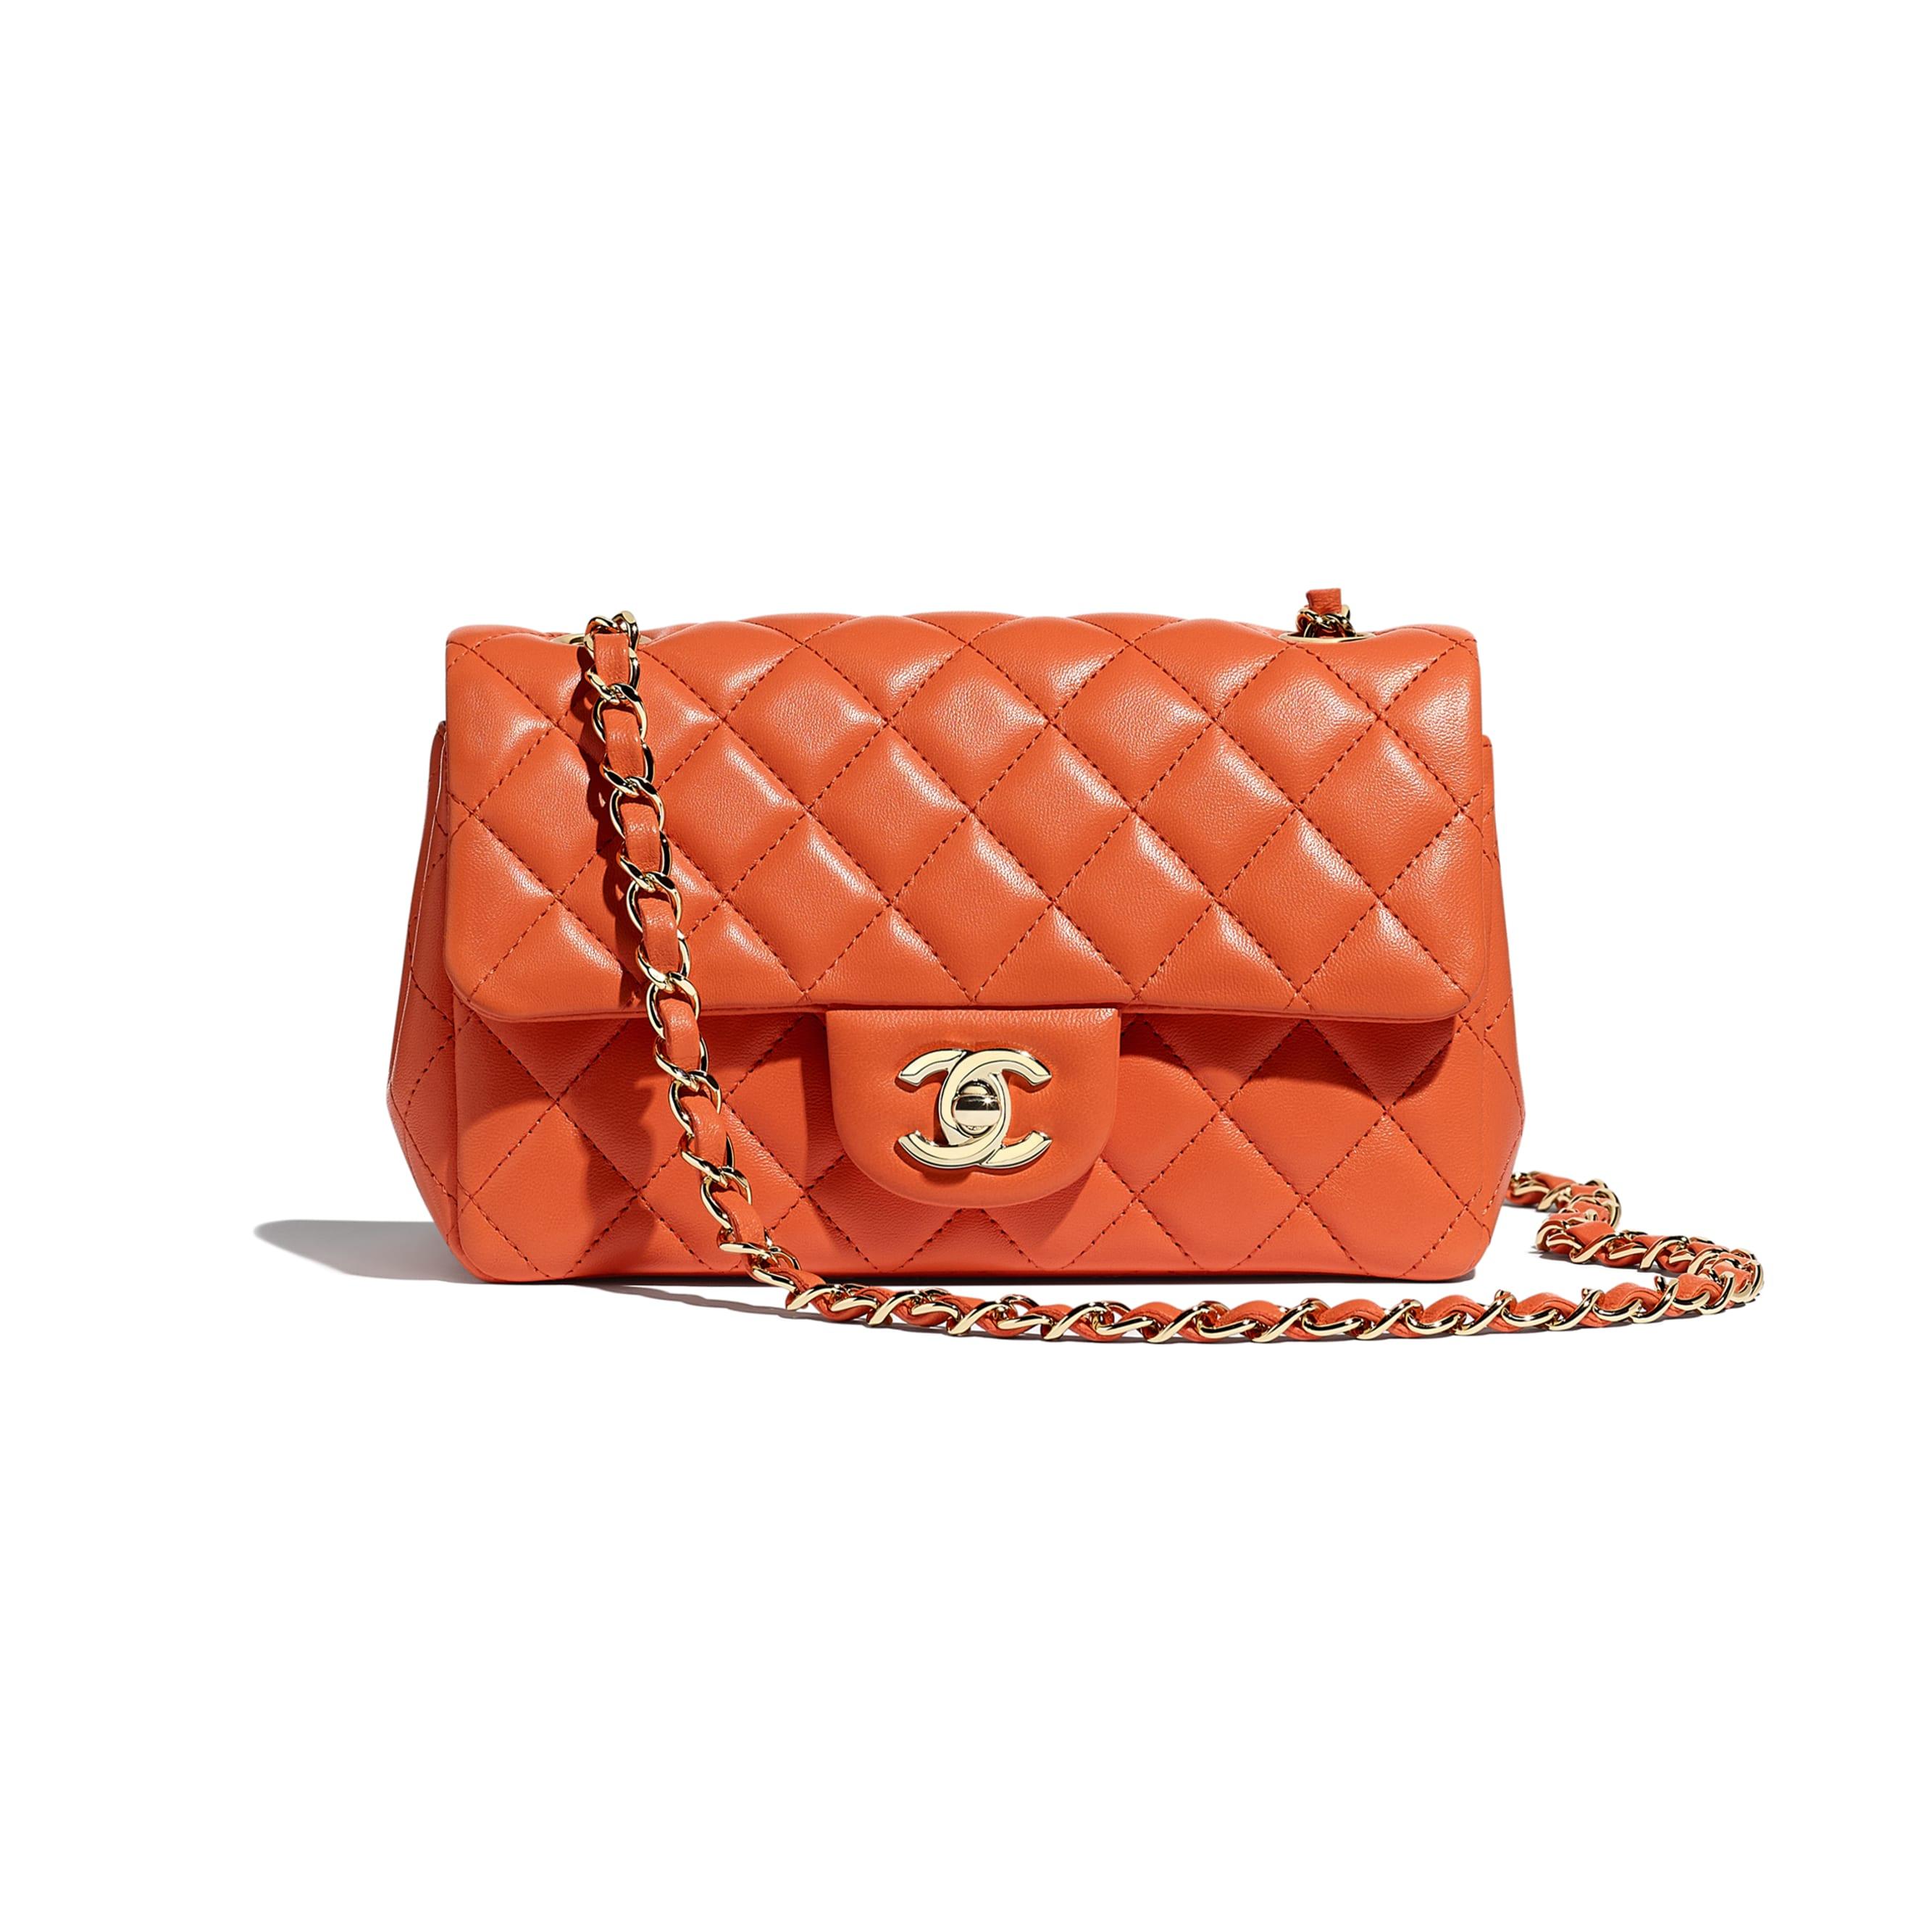 Mini Flap Bag - Orange - Lambskin & Gold-Tone Metal - CHANEL - Default view - see standard sized version